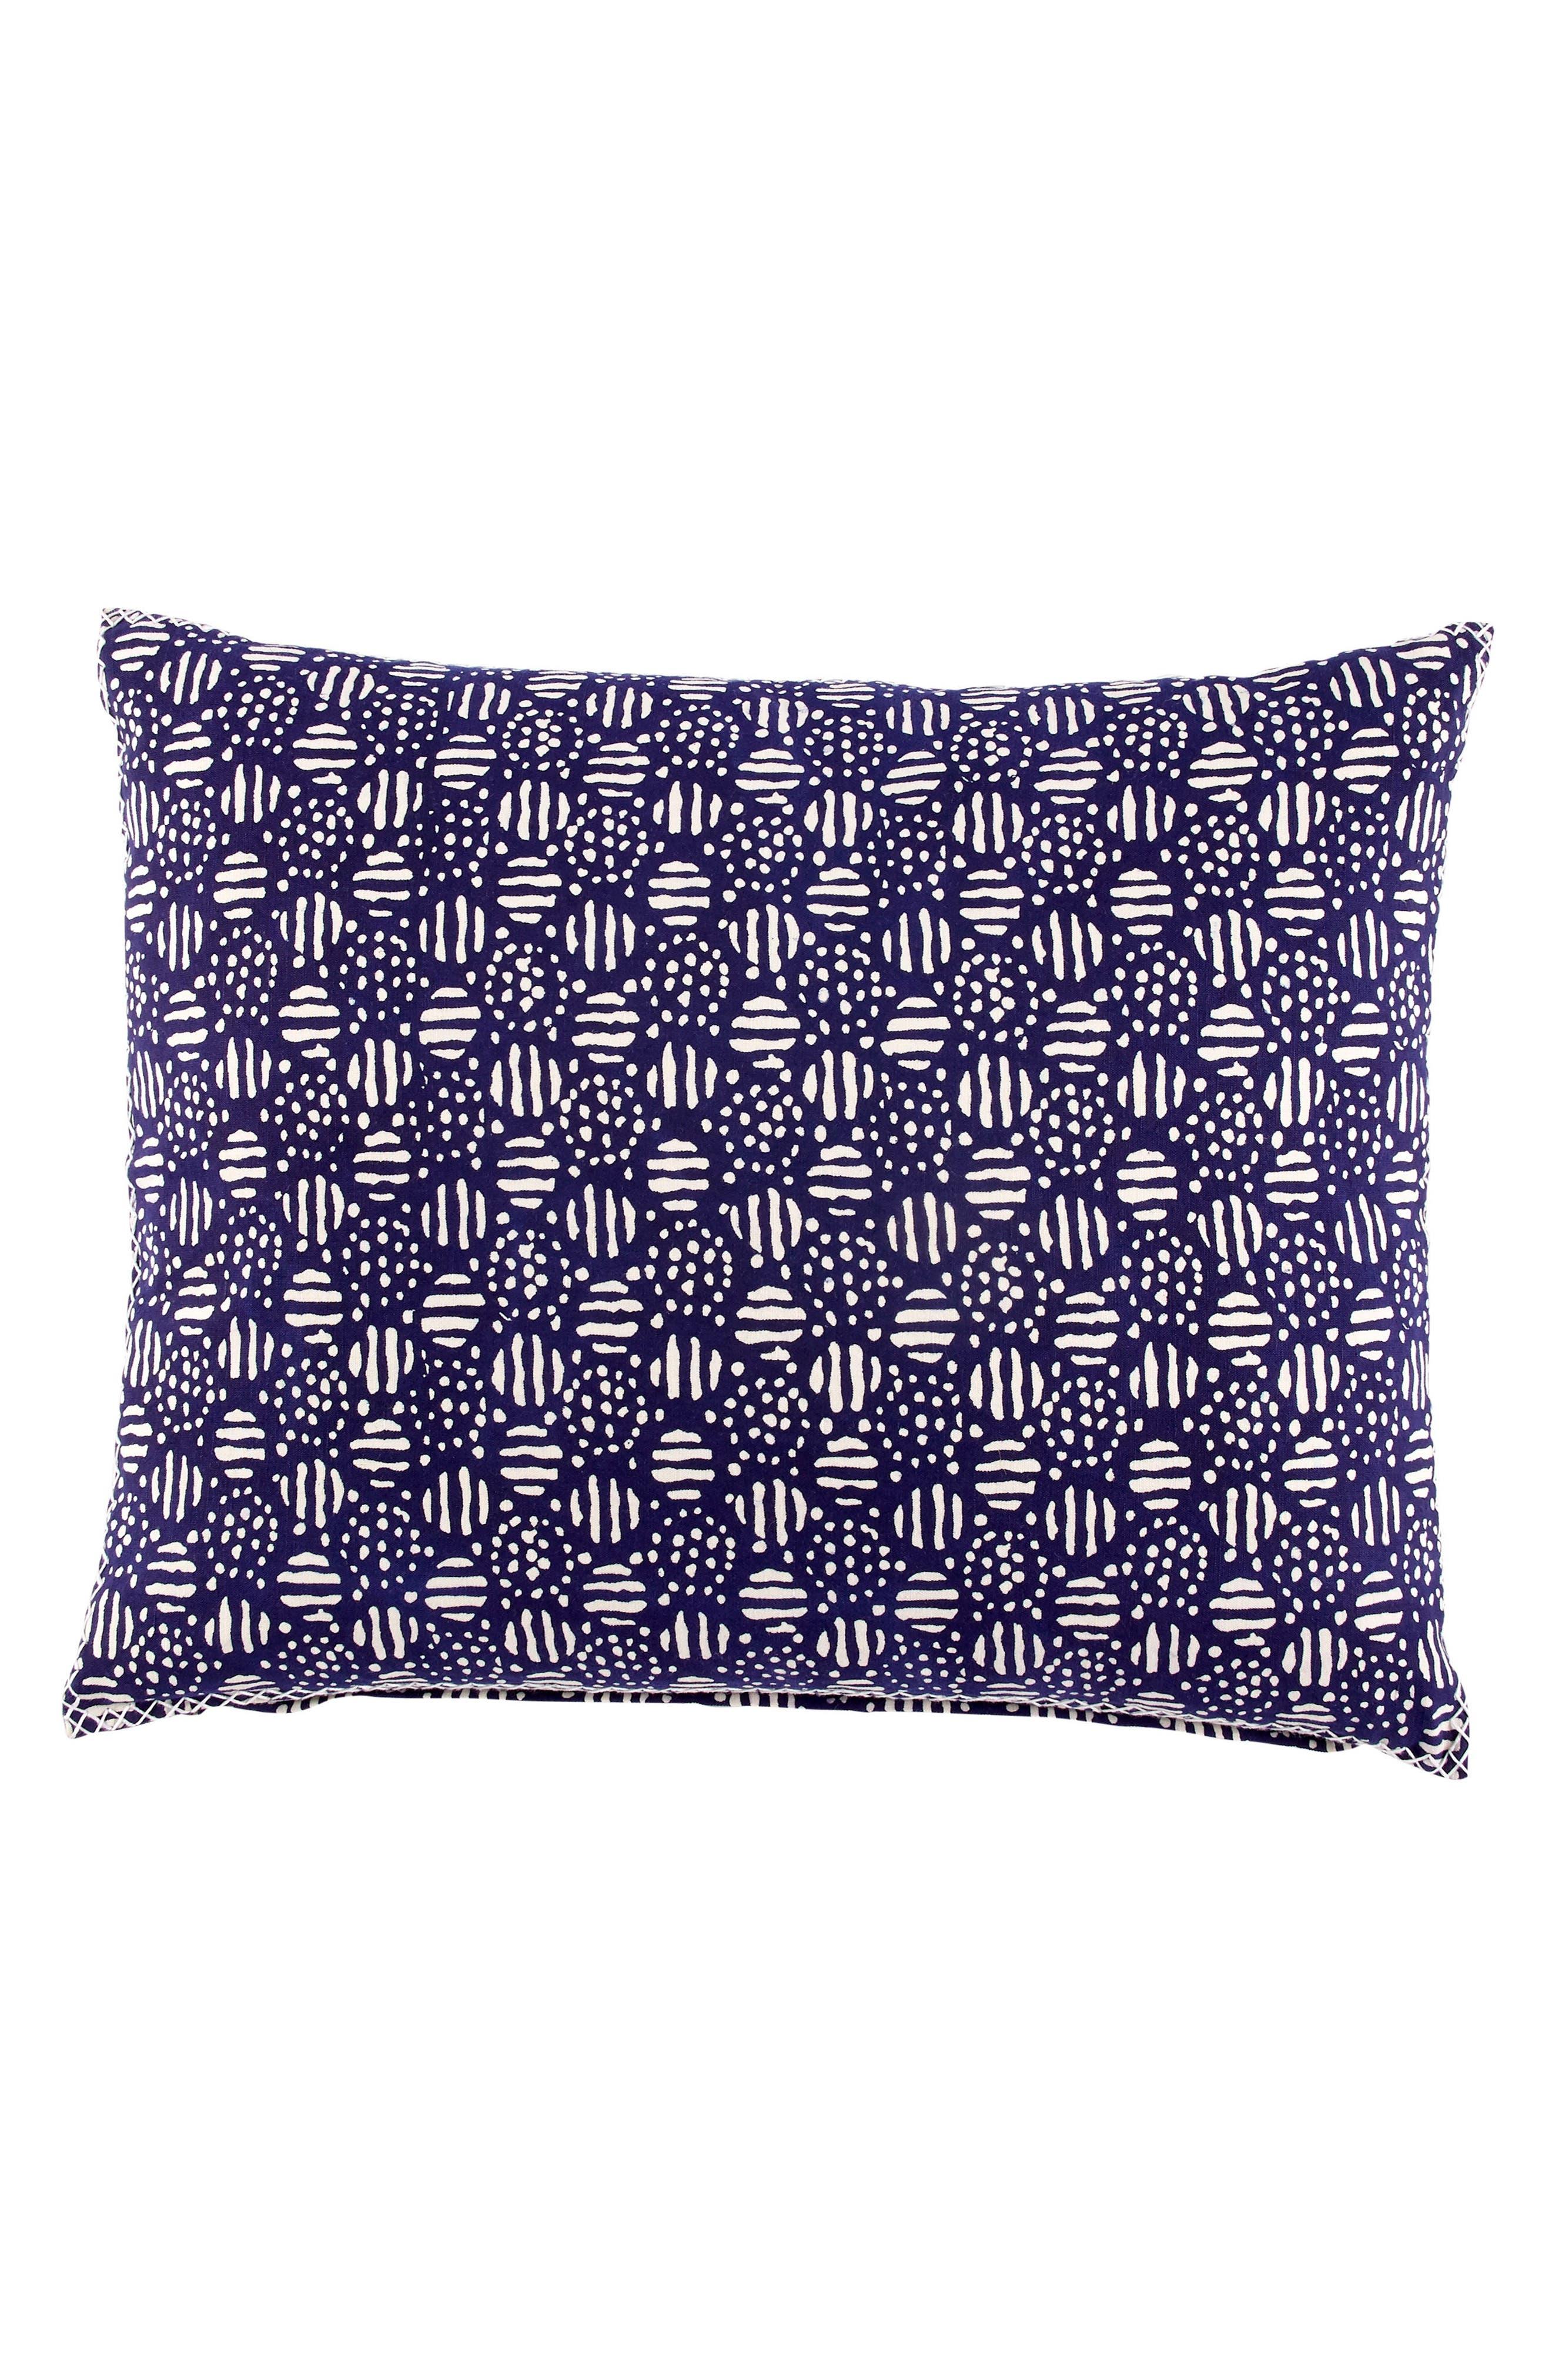 Main Image - John Robshaw Kimikosa Bolster Accent Pillow